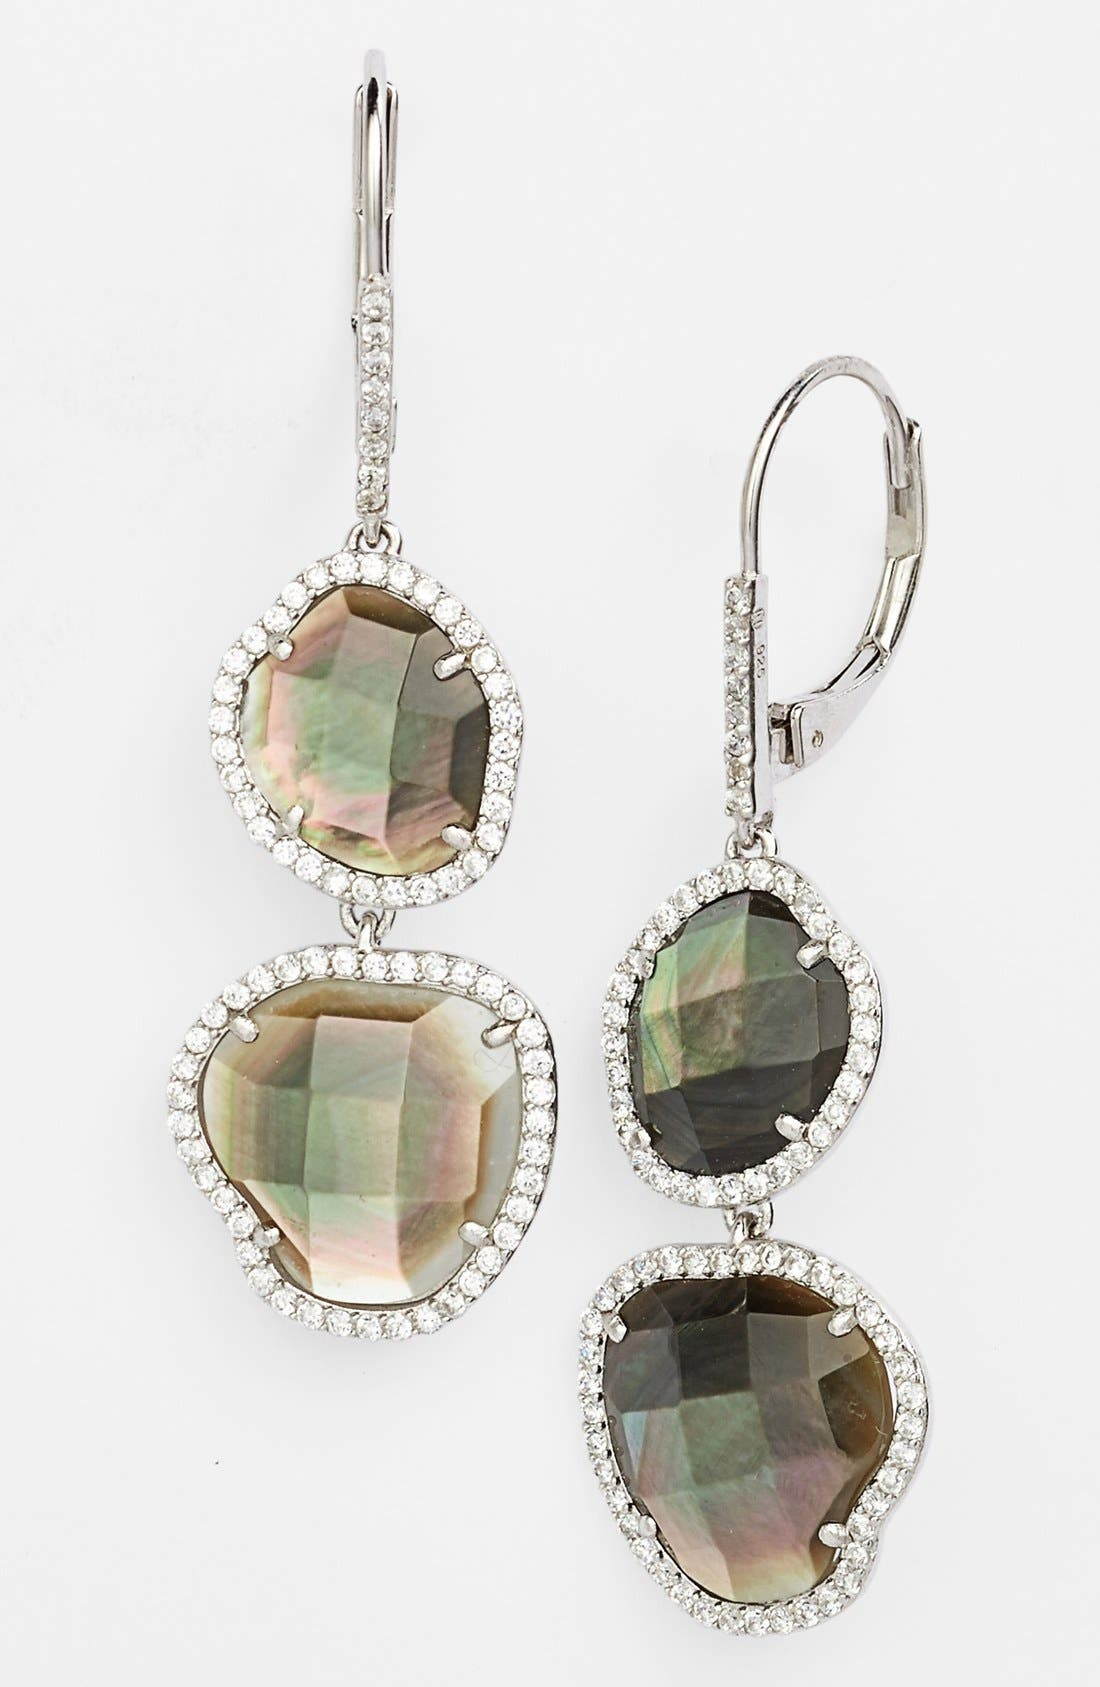 Alternate Image 1 Selected - Nadri Doublet Drop Earrings (Nordstrom Exclusive)